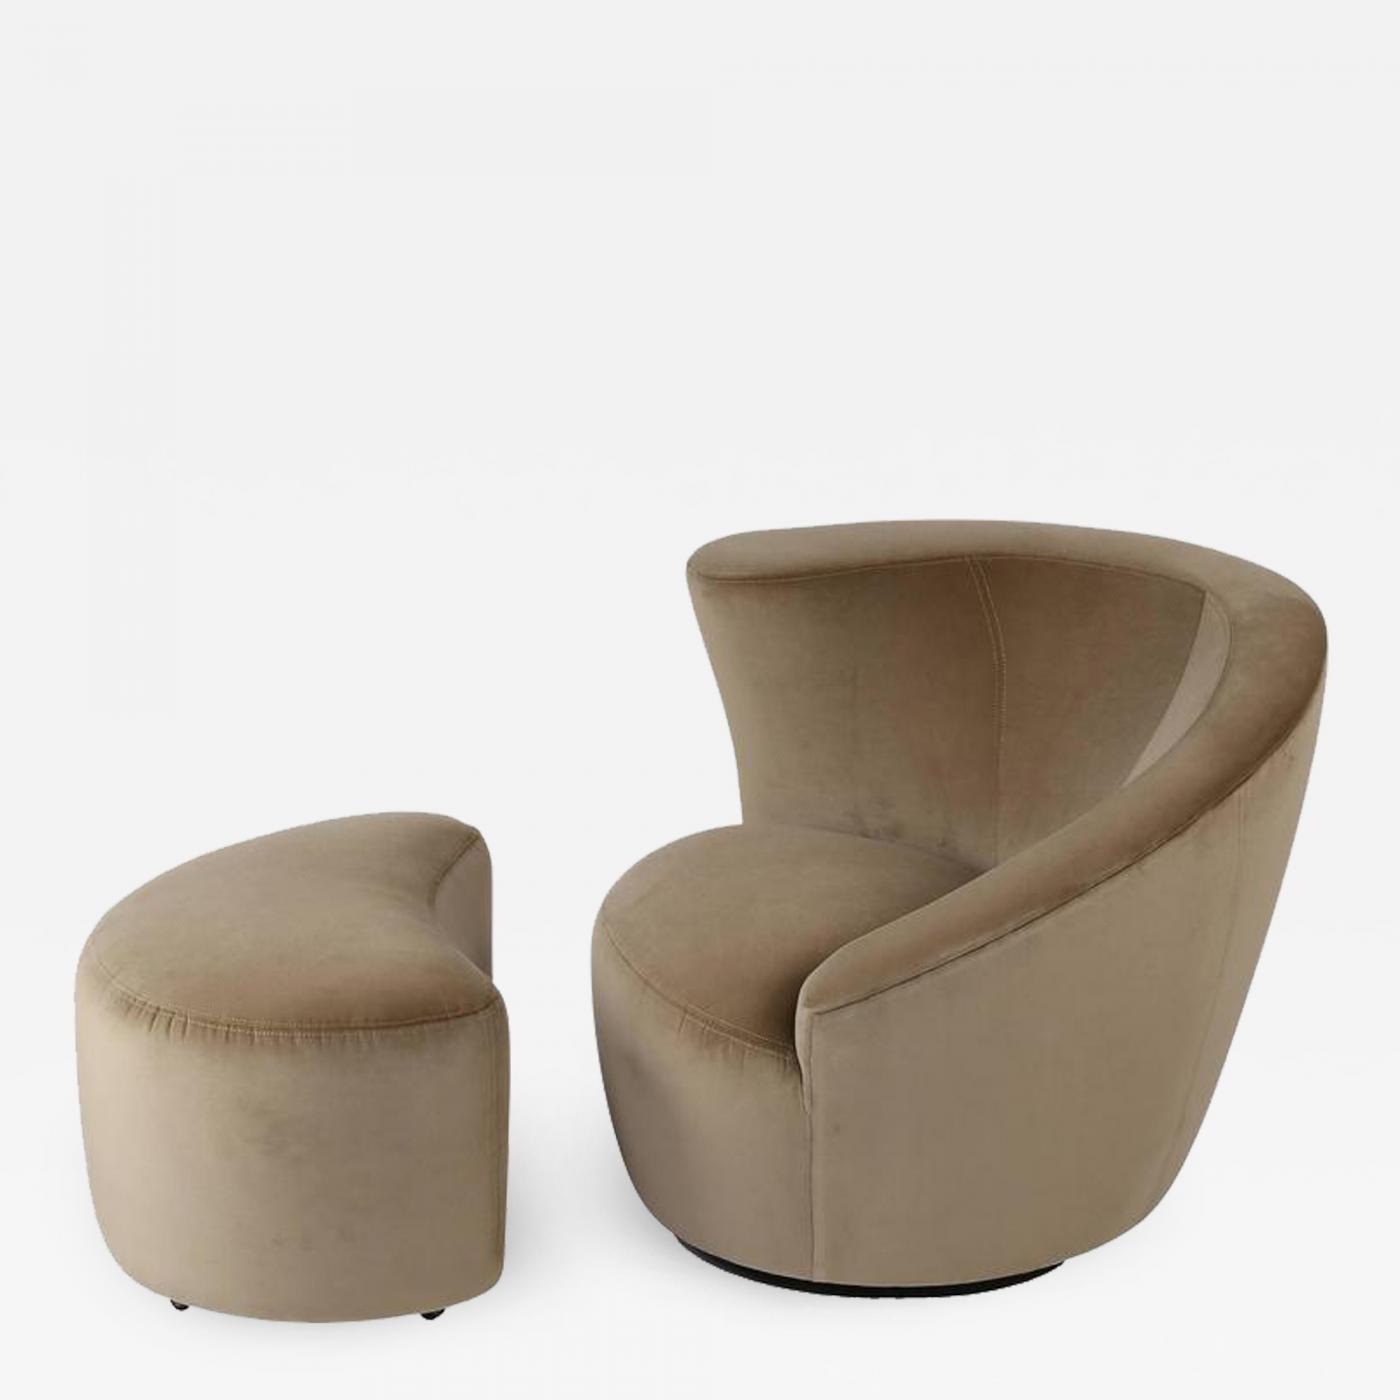 Admirable Vladimir Kagan Vladimir Kagan Corkscrew Swivel Chair And Ottoman In Tan Velvet Circa 1990S Pabps2019 Chair Design Images Pabps2019Com